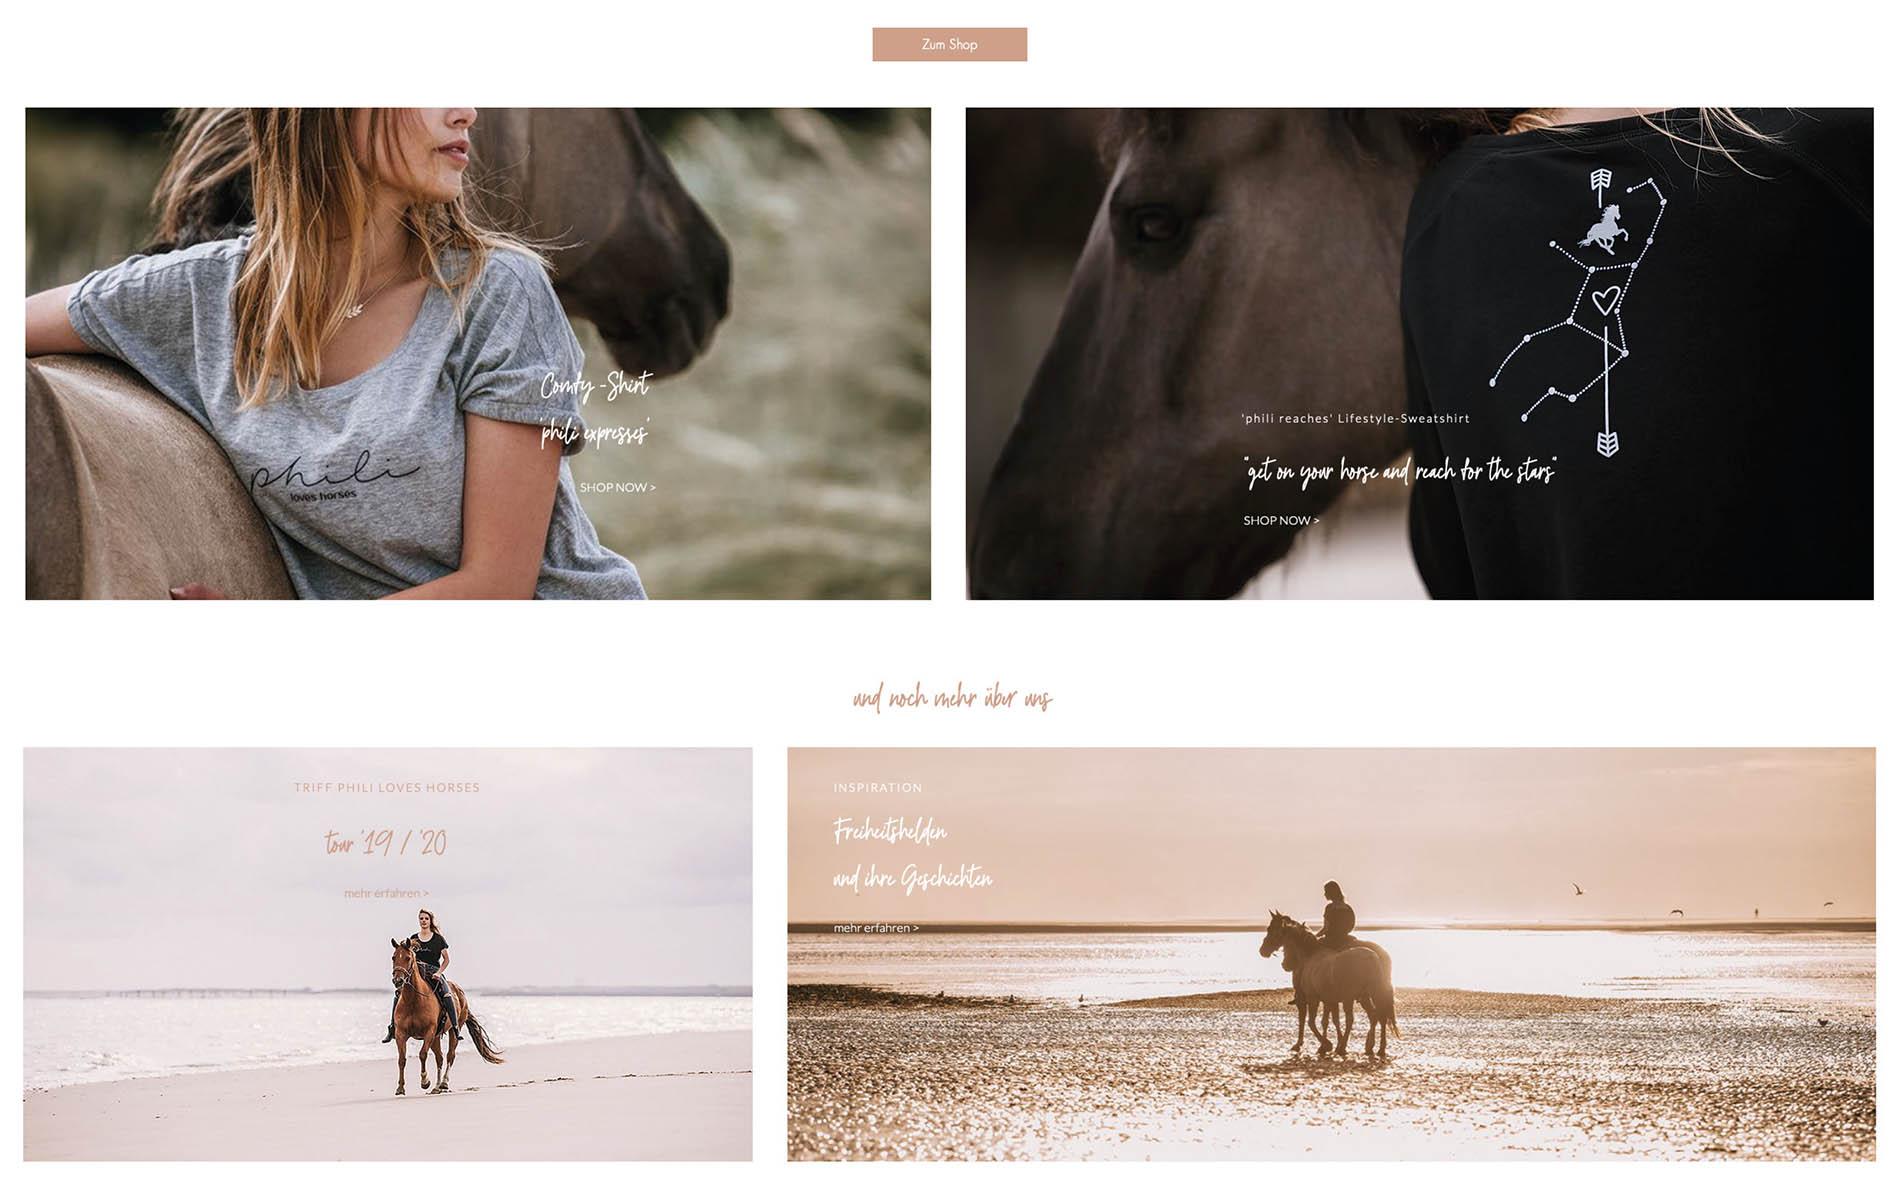 Webseite PhiliLoveHorses - Fotos Alexandra Evang Photographie